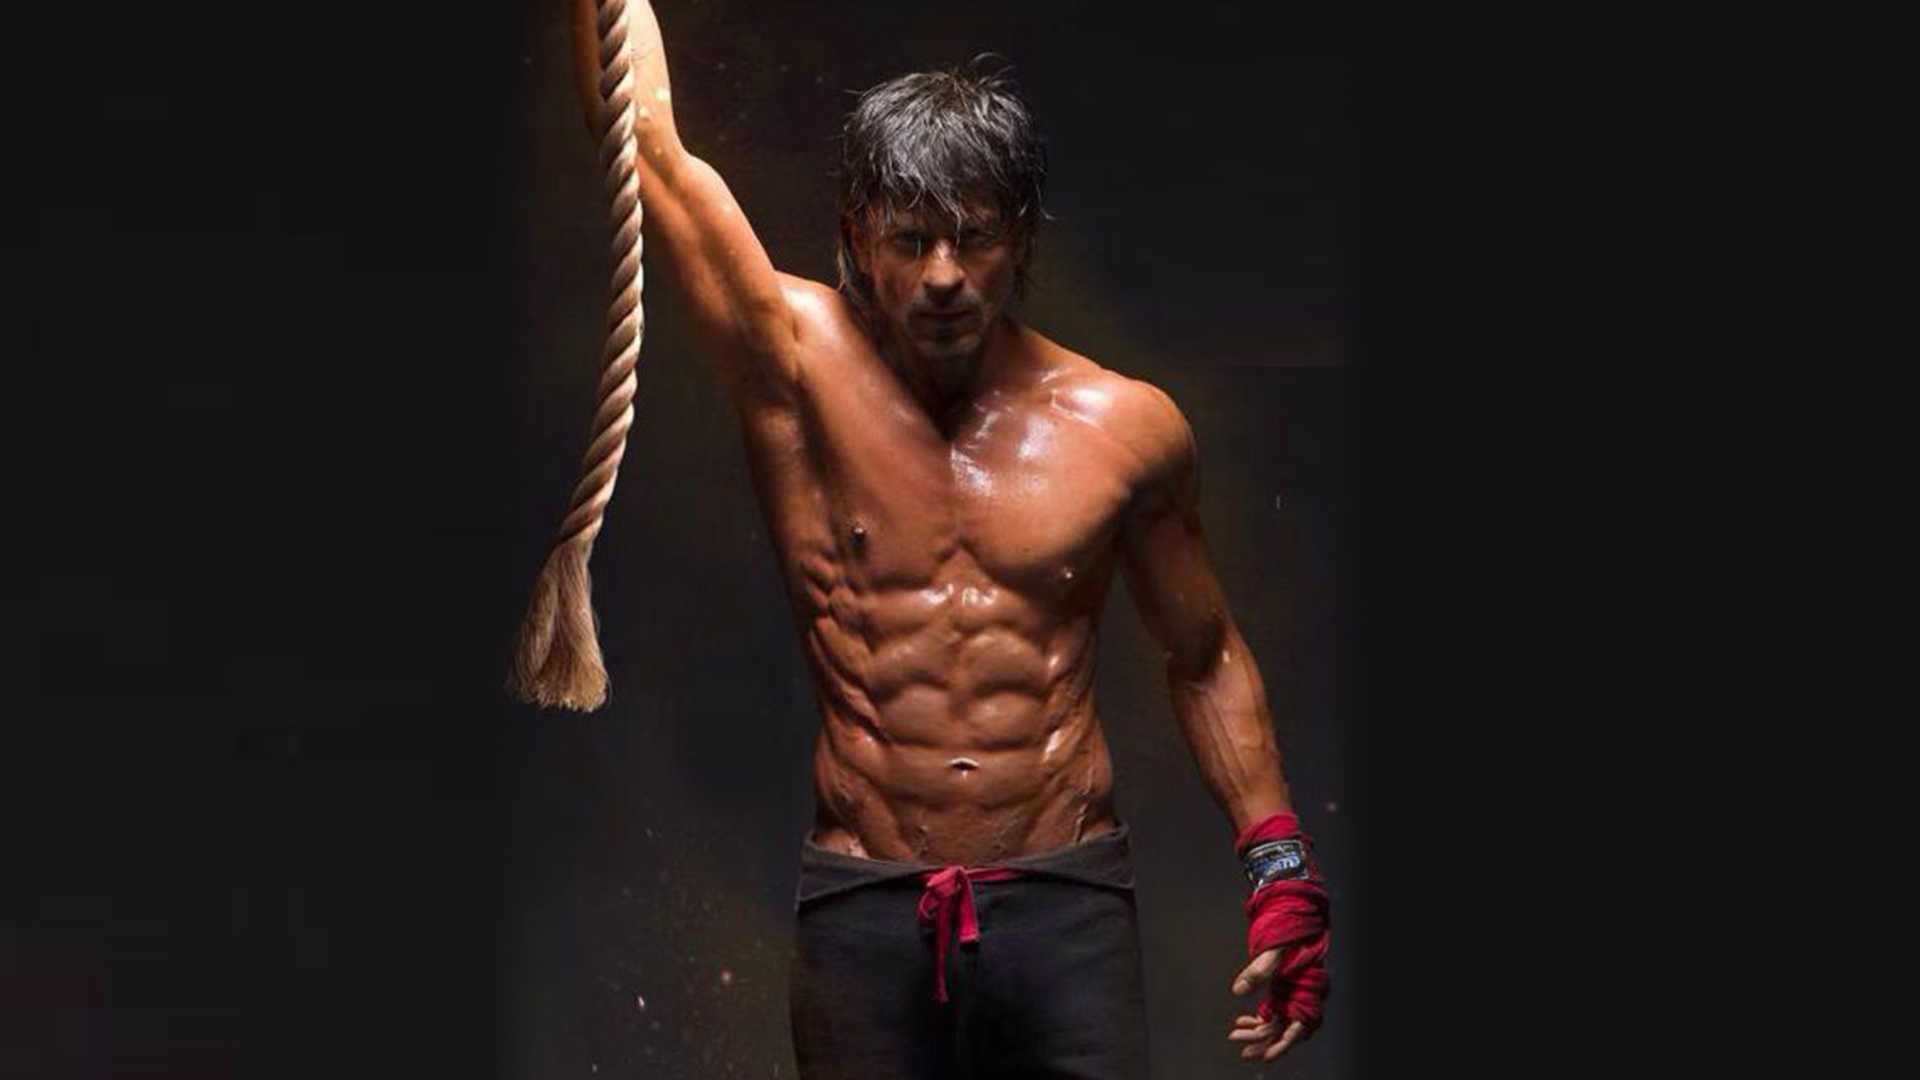 Srk 3d Wallpaper The Secret To Shah Rukh Khan S Six Pack Gq India Live